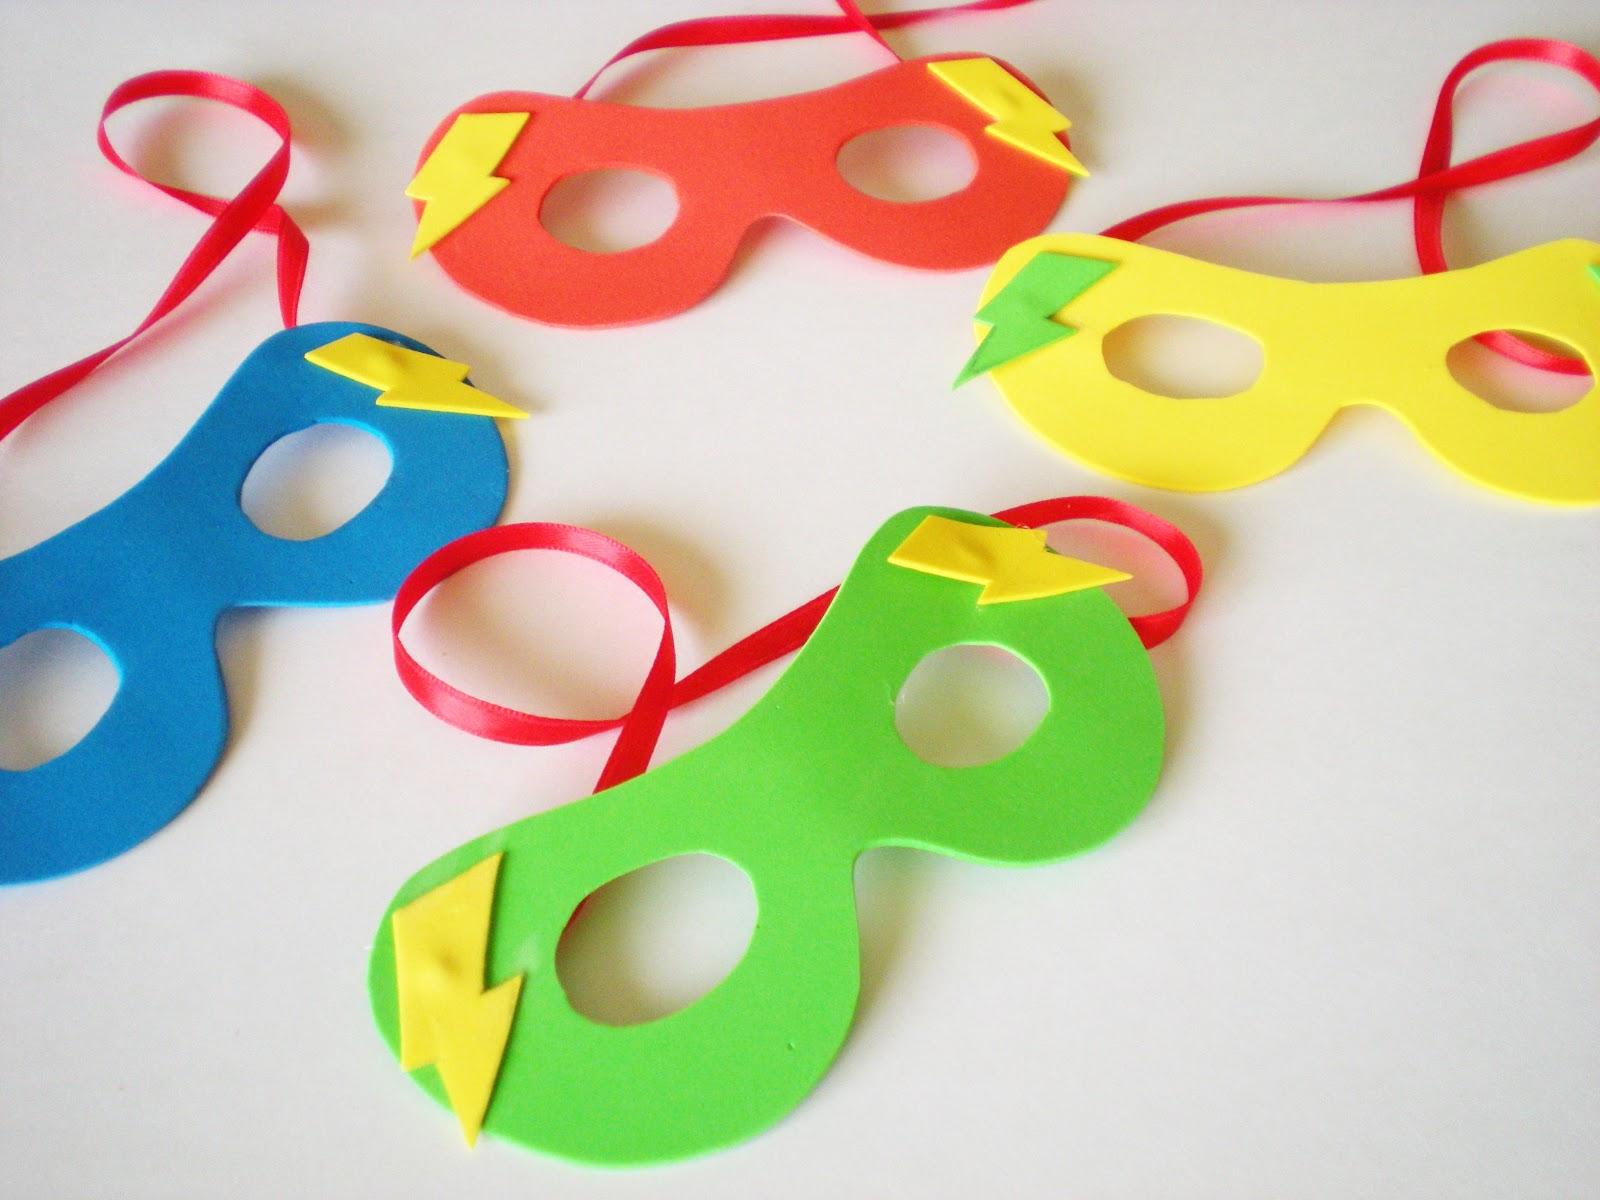 superhero mask template for kids - batman mask template car interior design